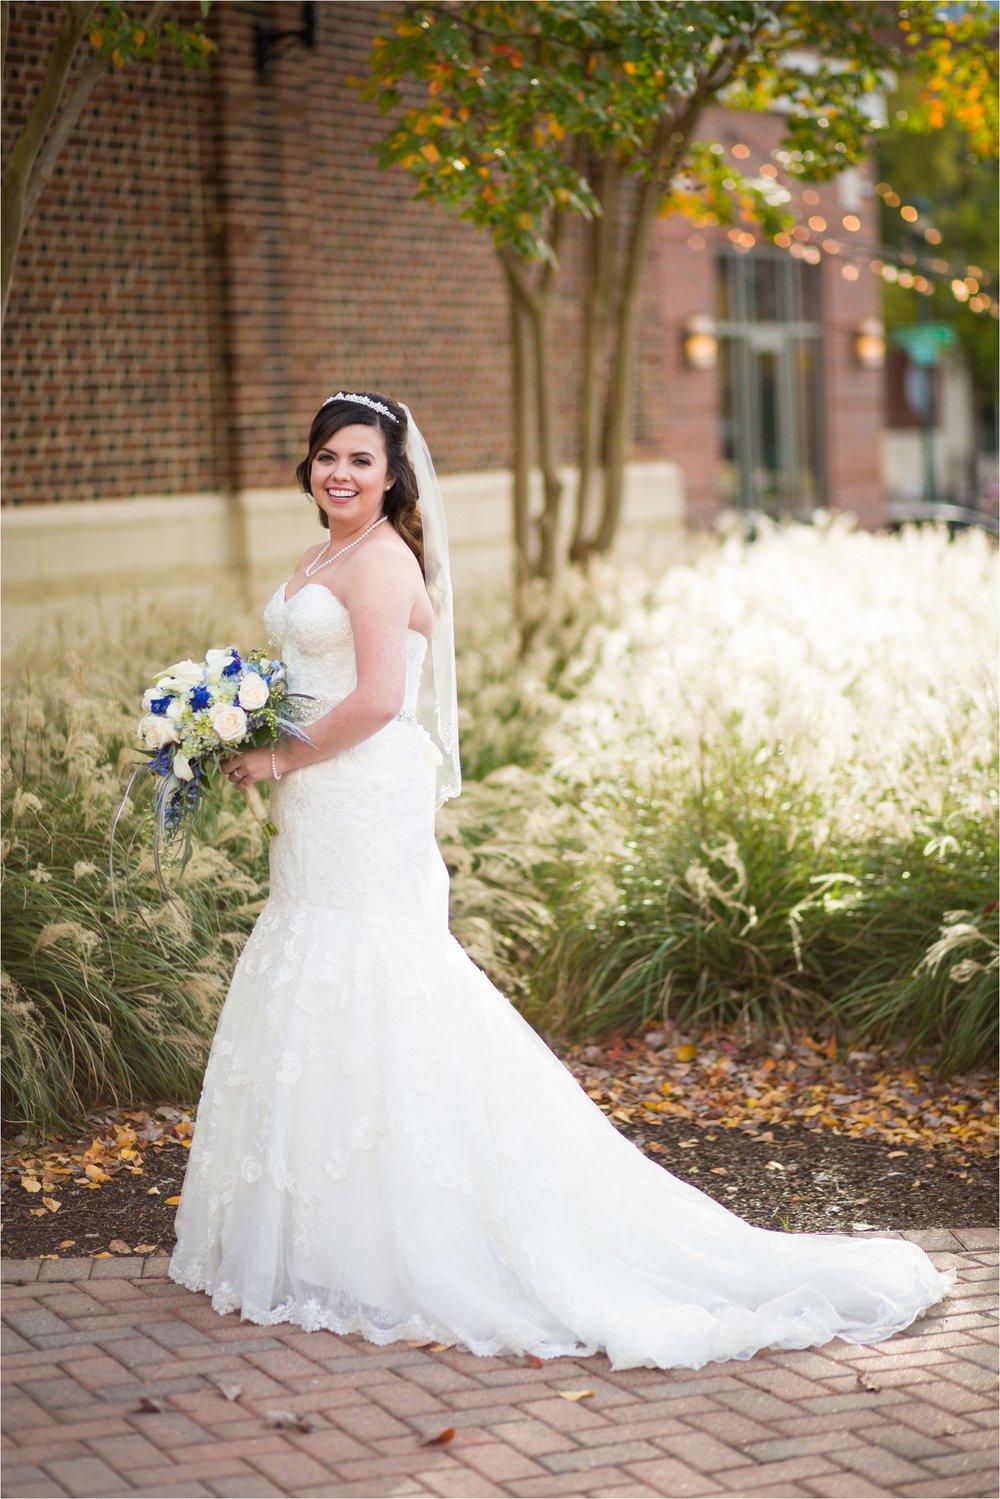 Newport-News-Winter-Wonderland-Wedding_0130.jpg